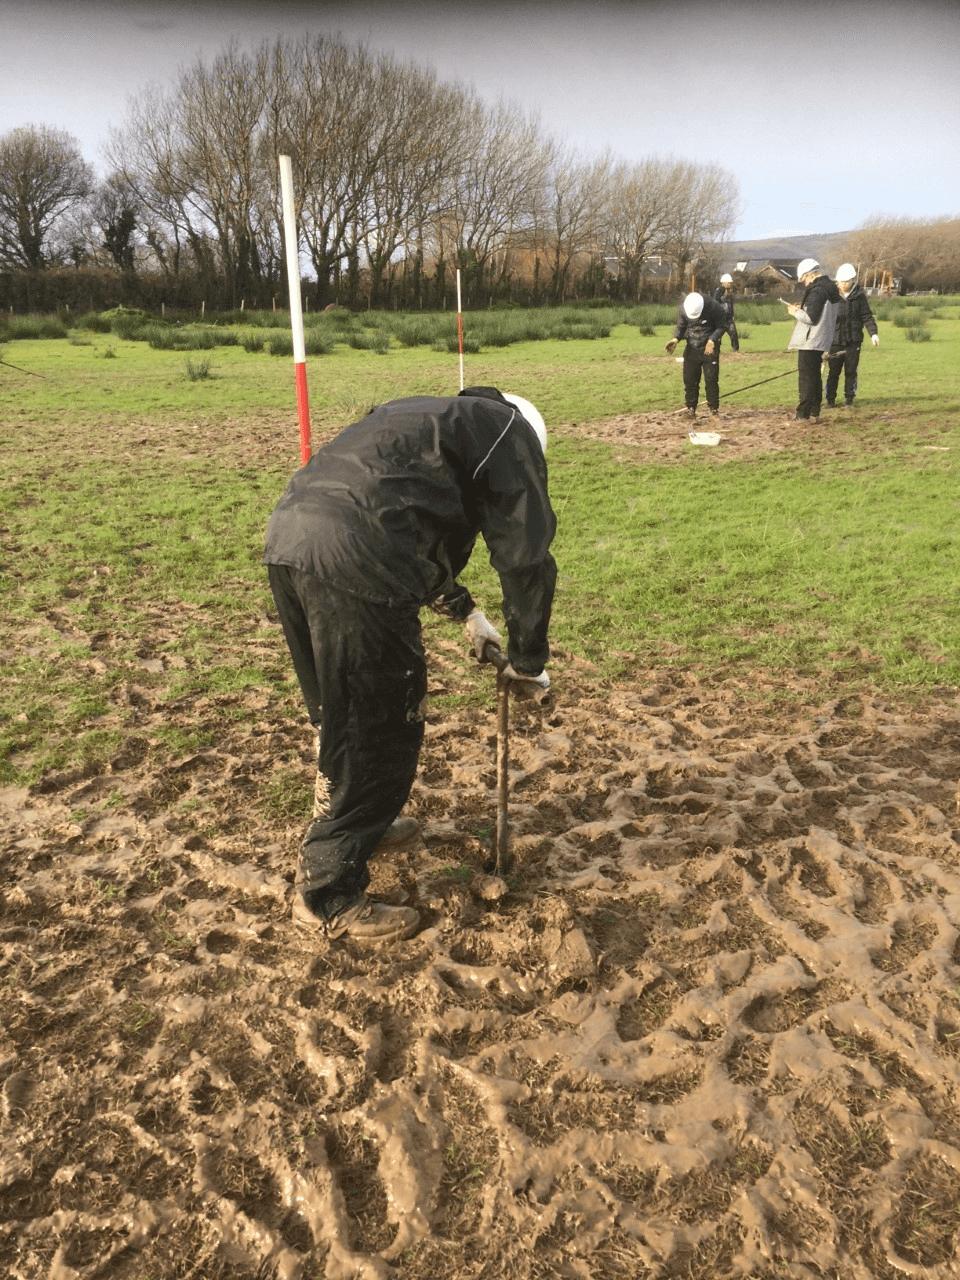 Me using a dutch auger in a very muddy field!